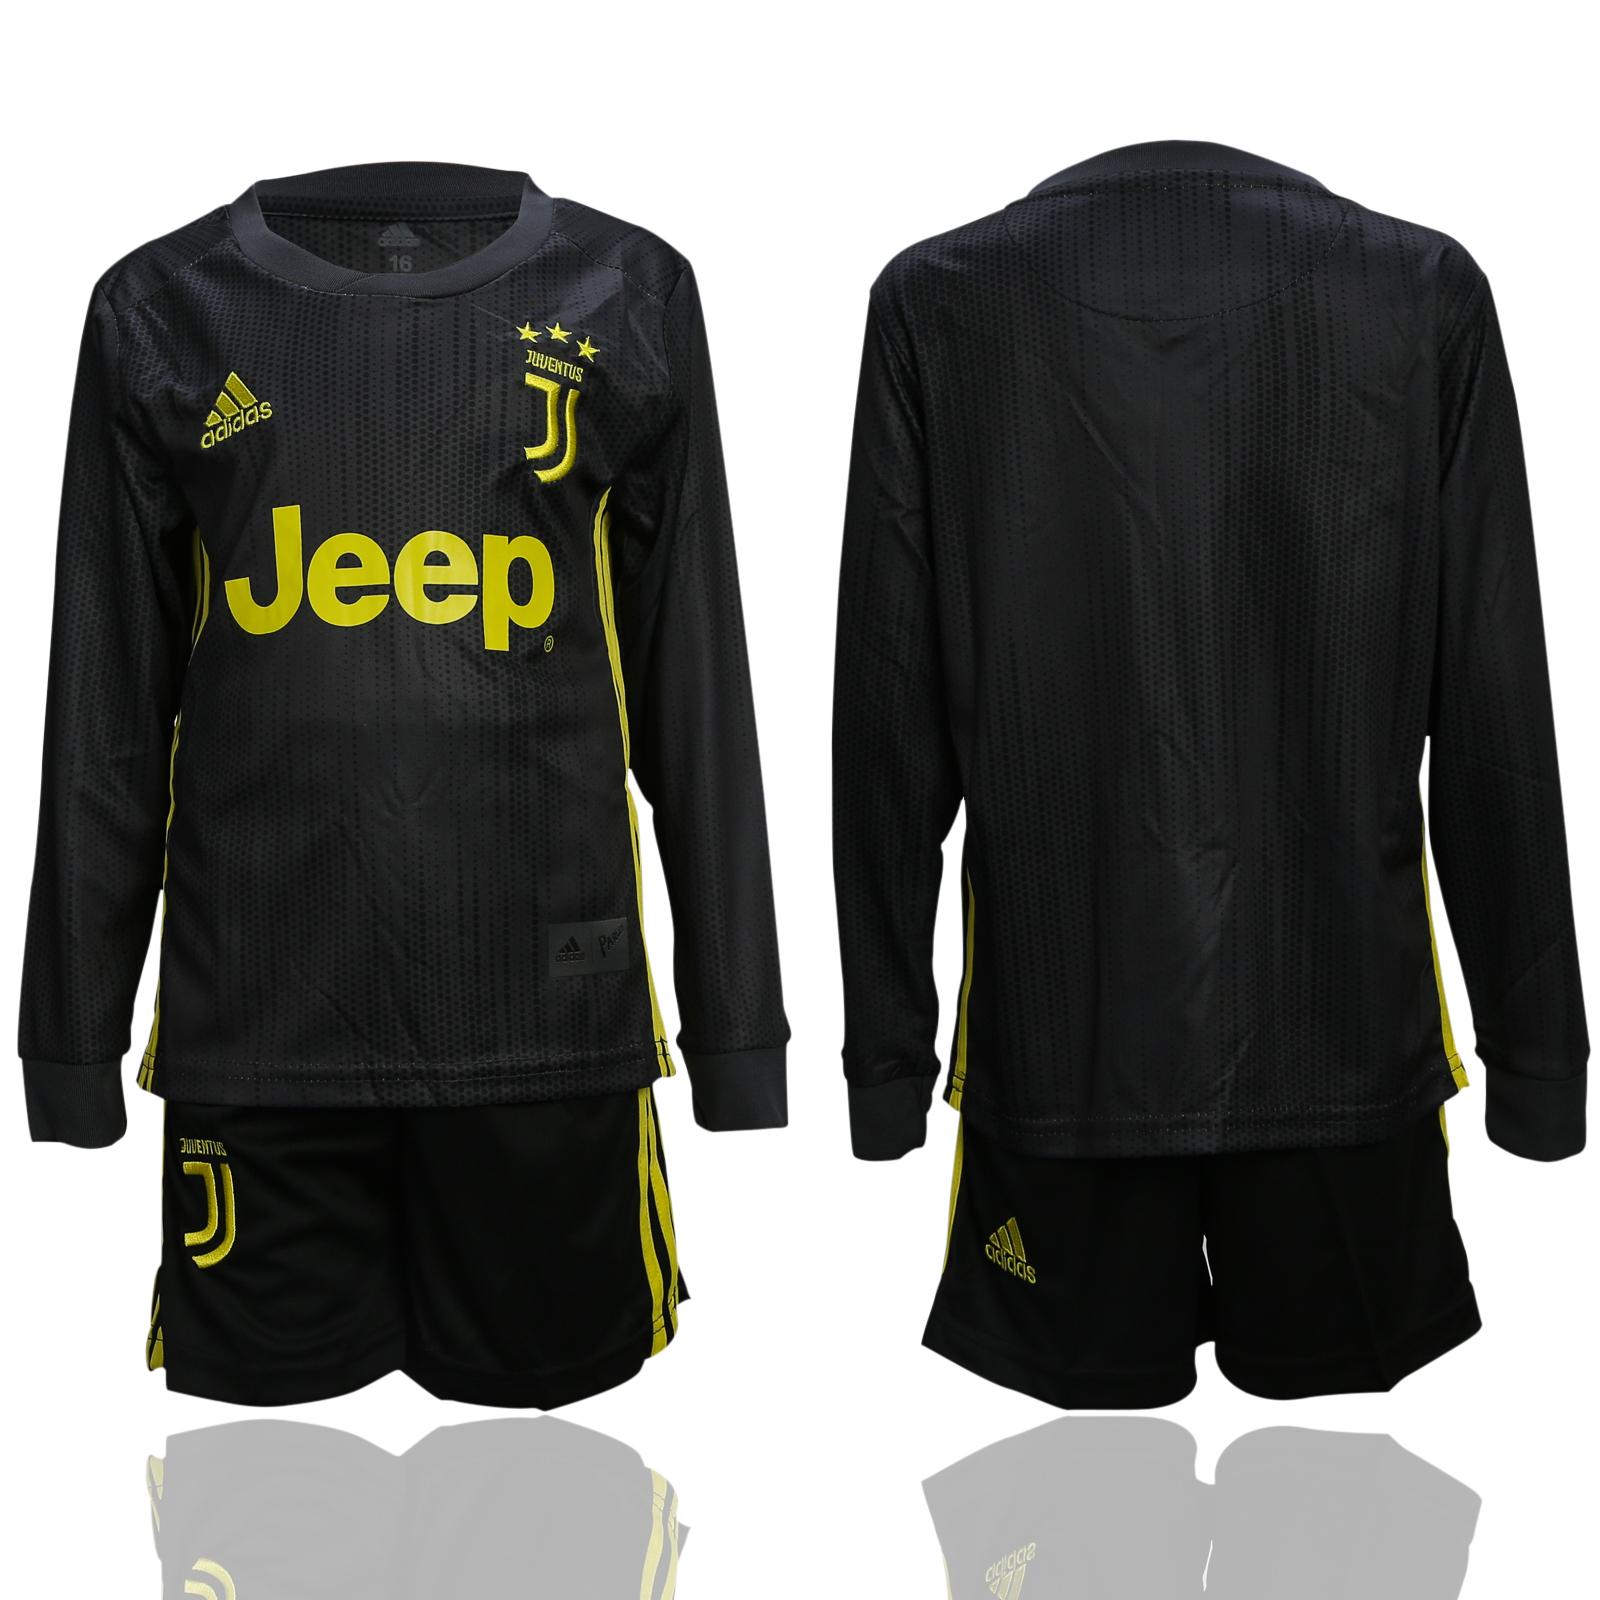 2018-19 Juventus Third Away Youth Long Sleeve Soccer Jersey